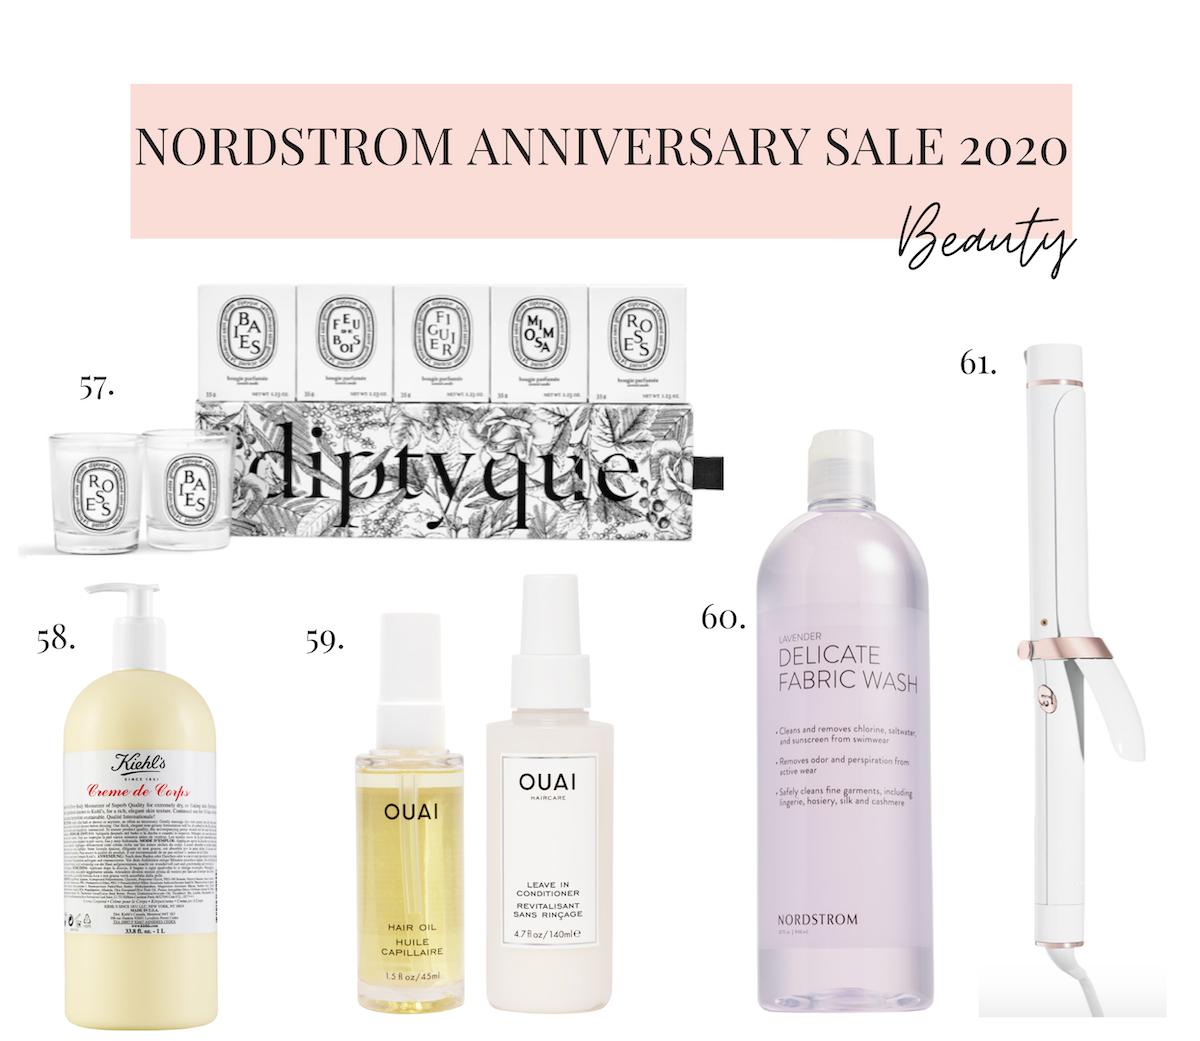 Nordstrom anniversary sale 2020 beauty picks